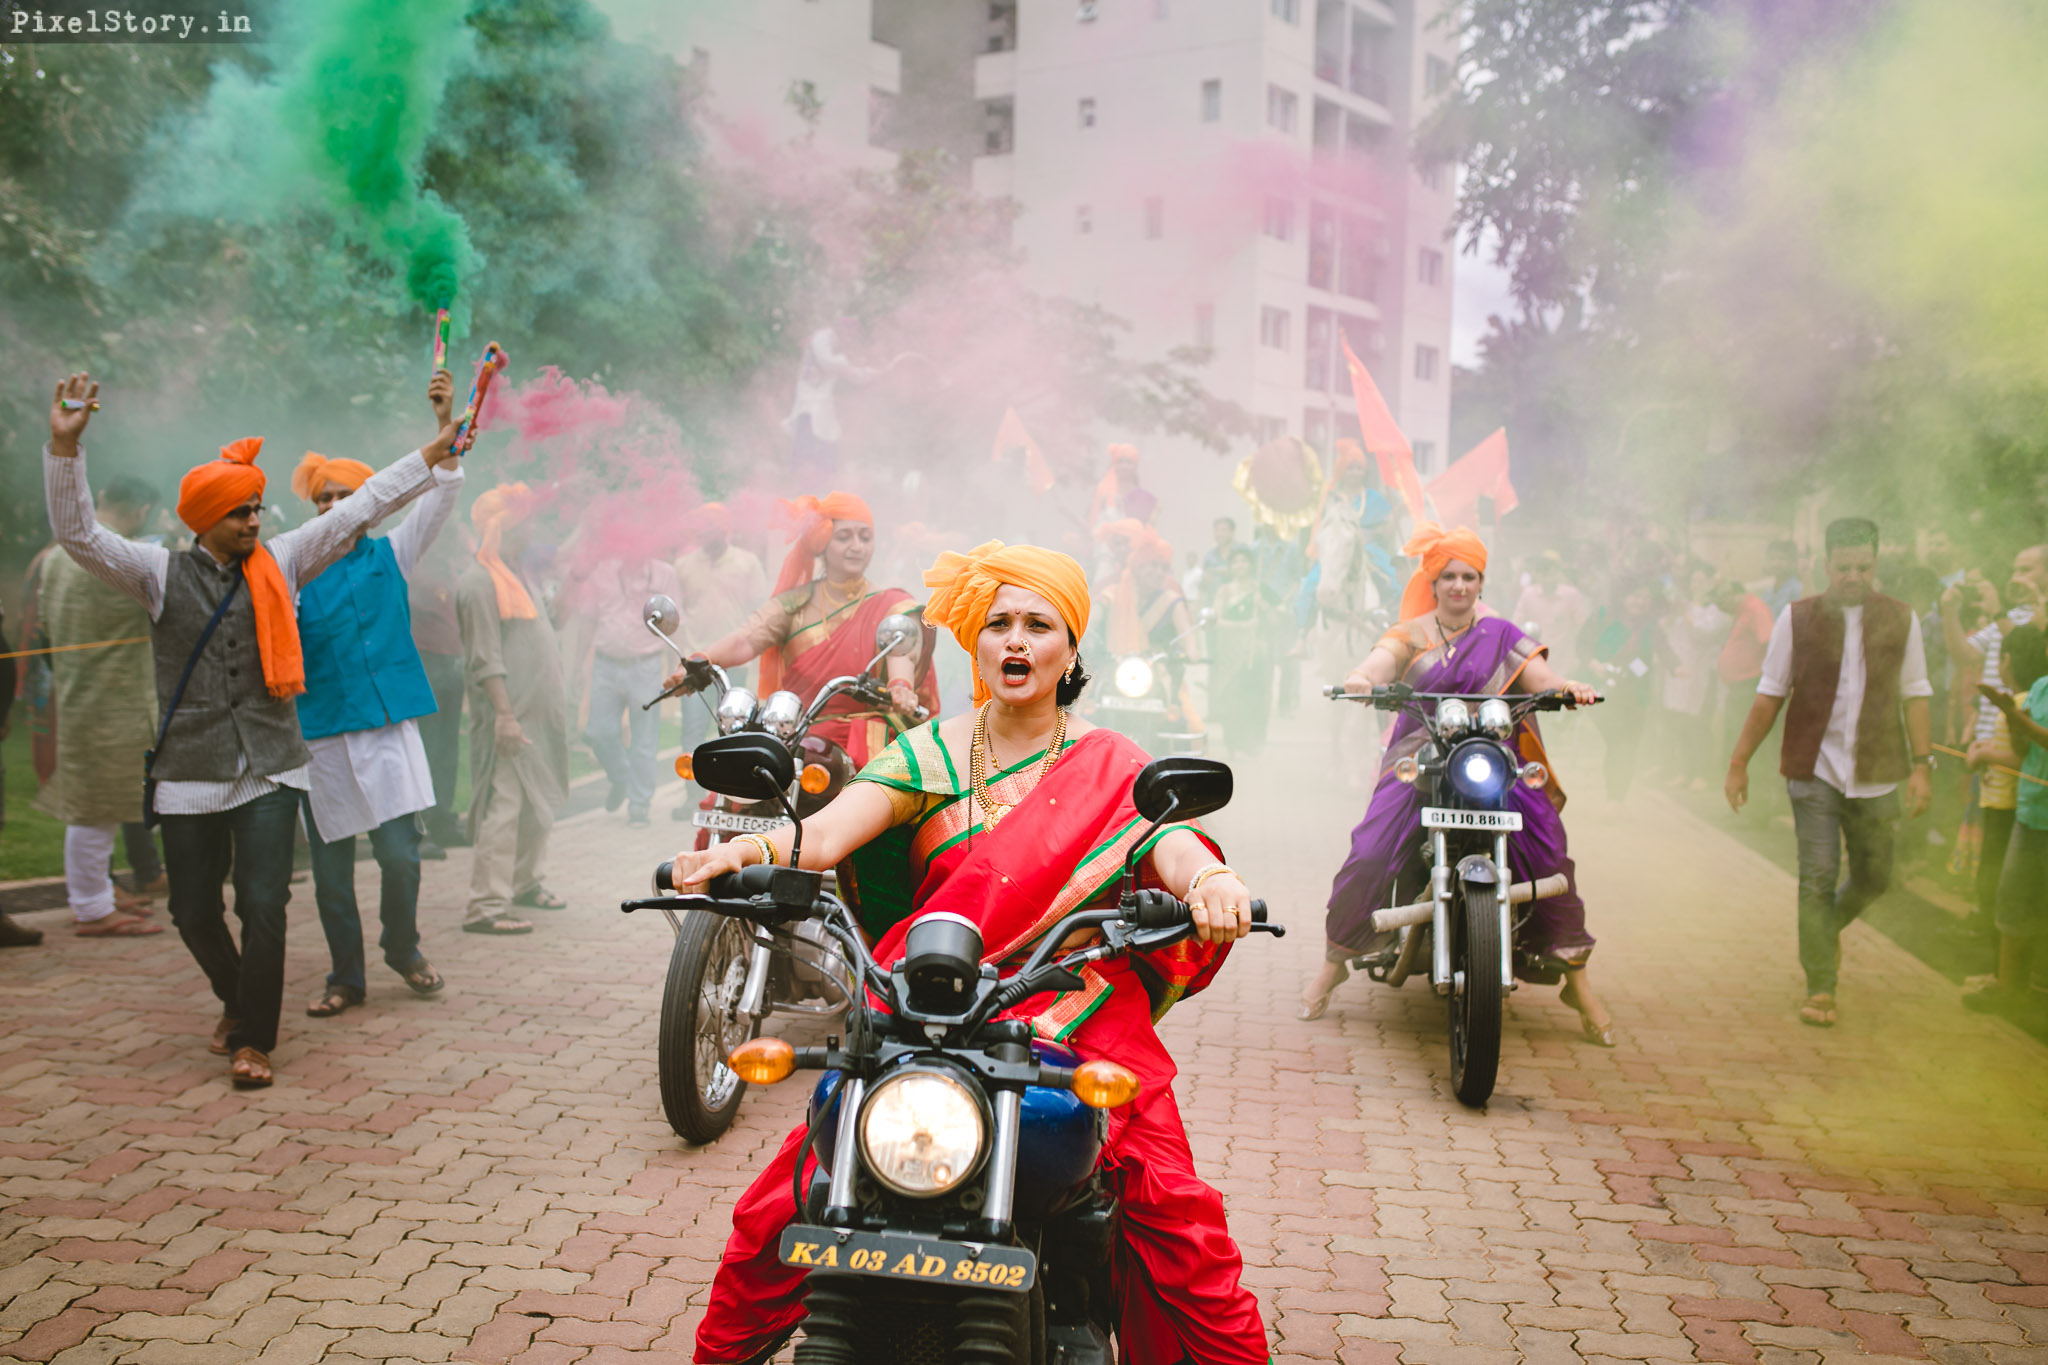 PixelStory-Ganesh-Utsav-2017-007.jpg